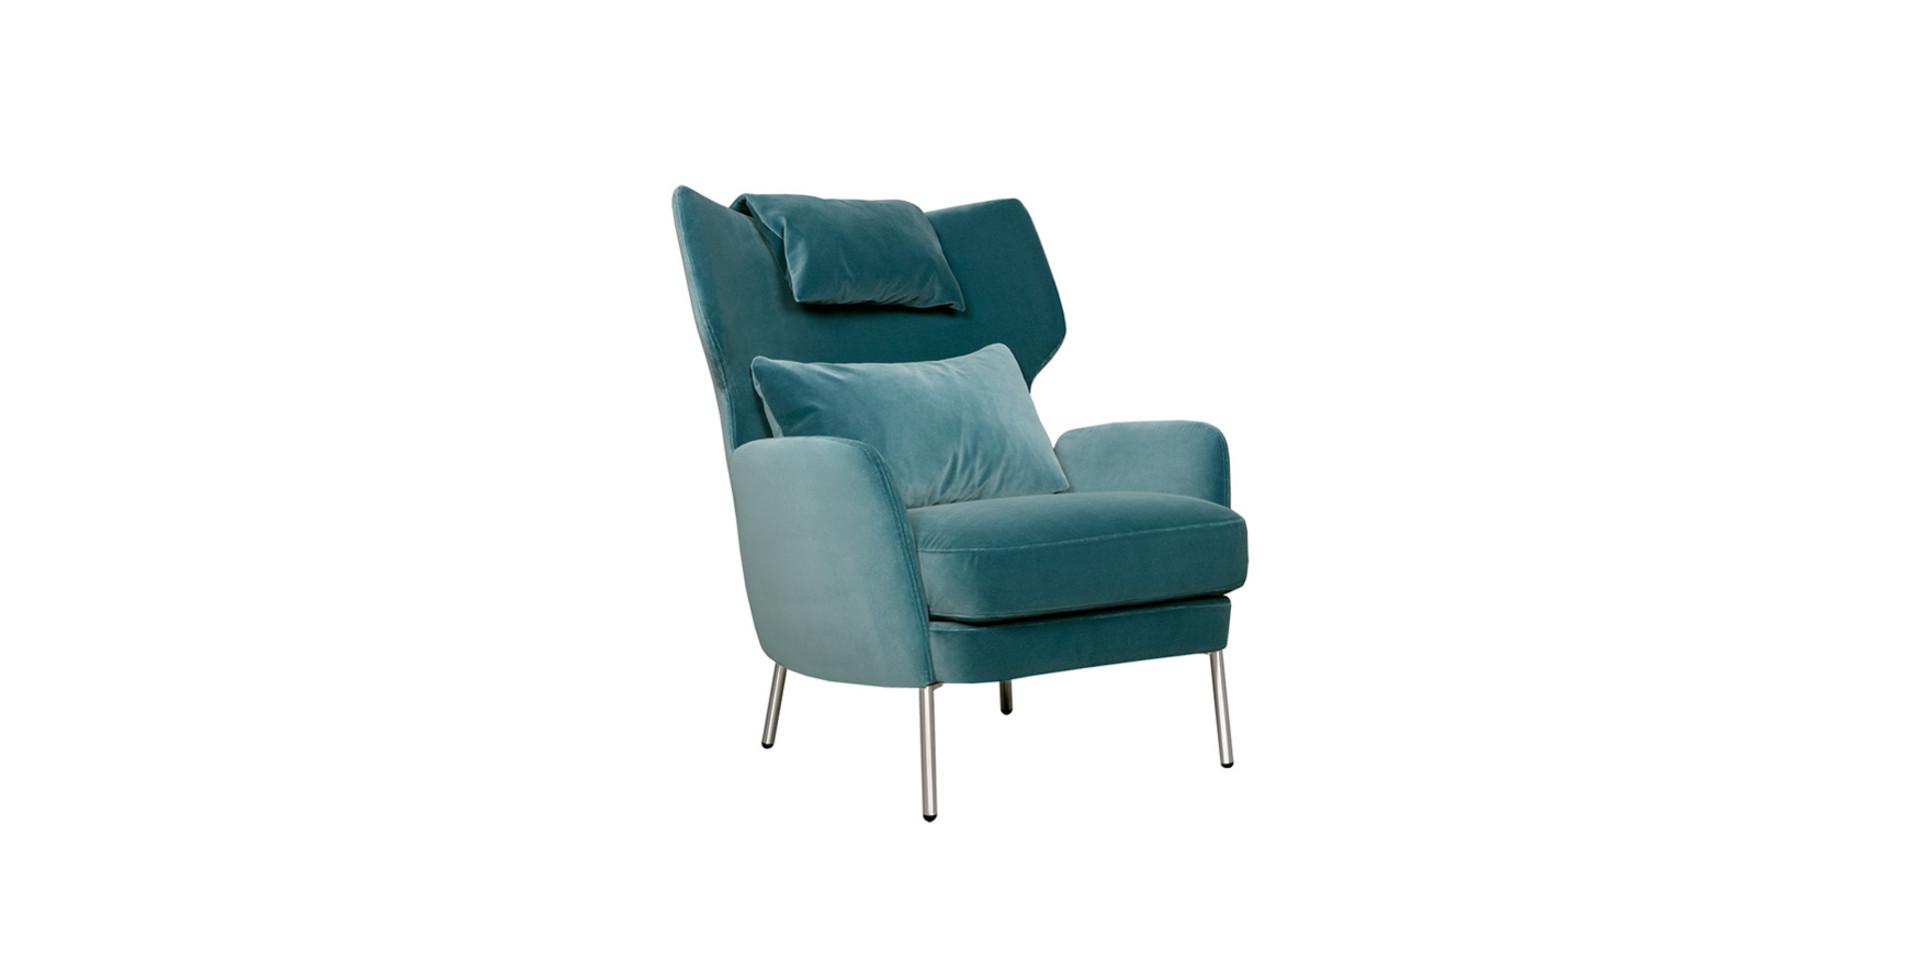 ALEX_armchair_headrest_lario1406_turquoise_2